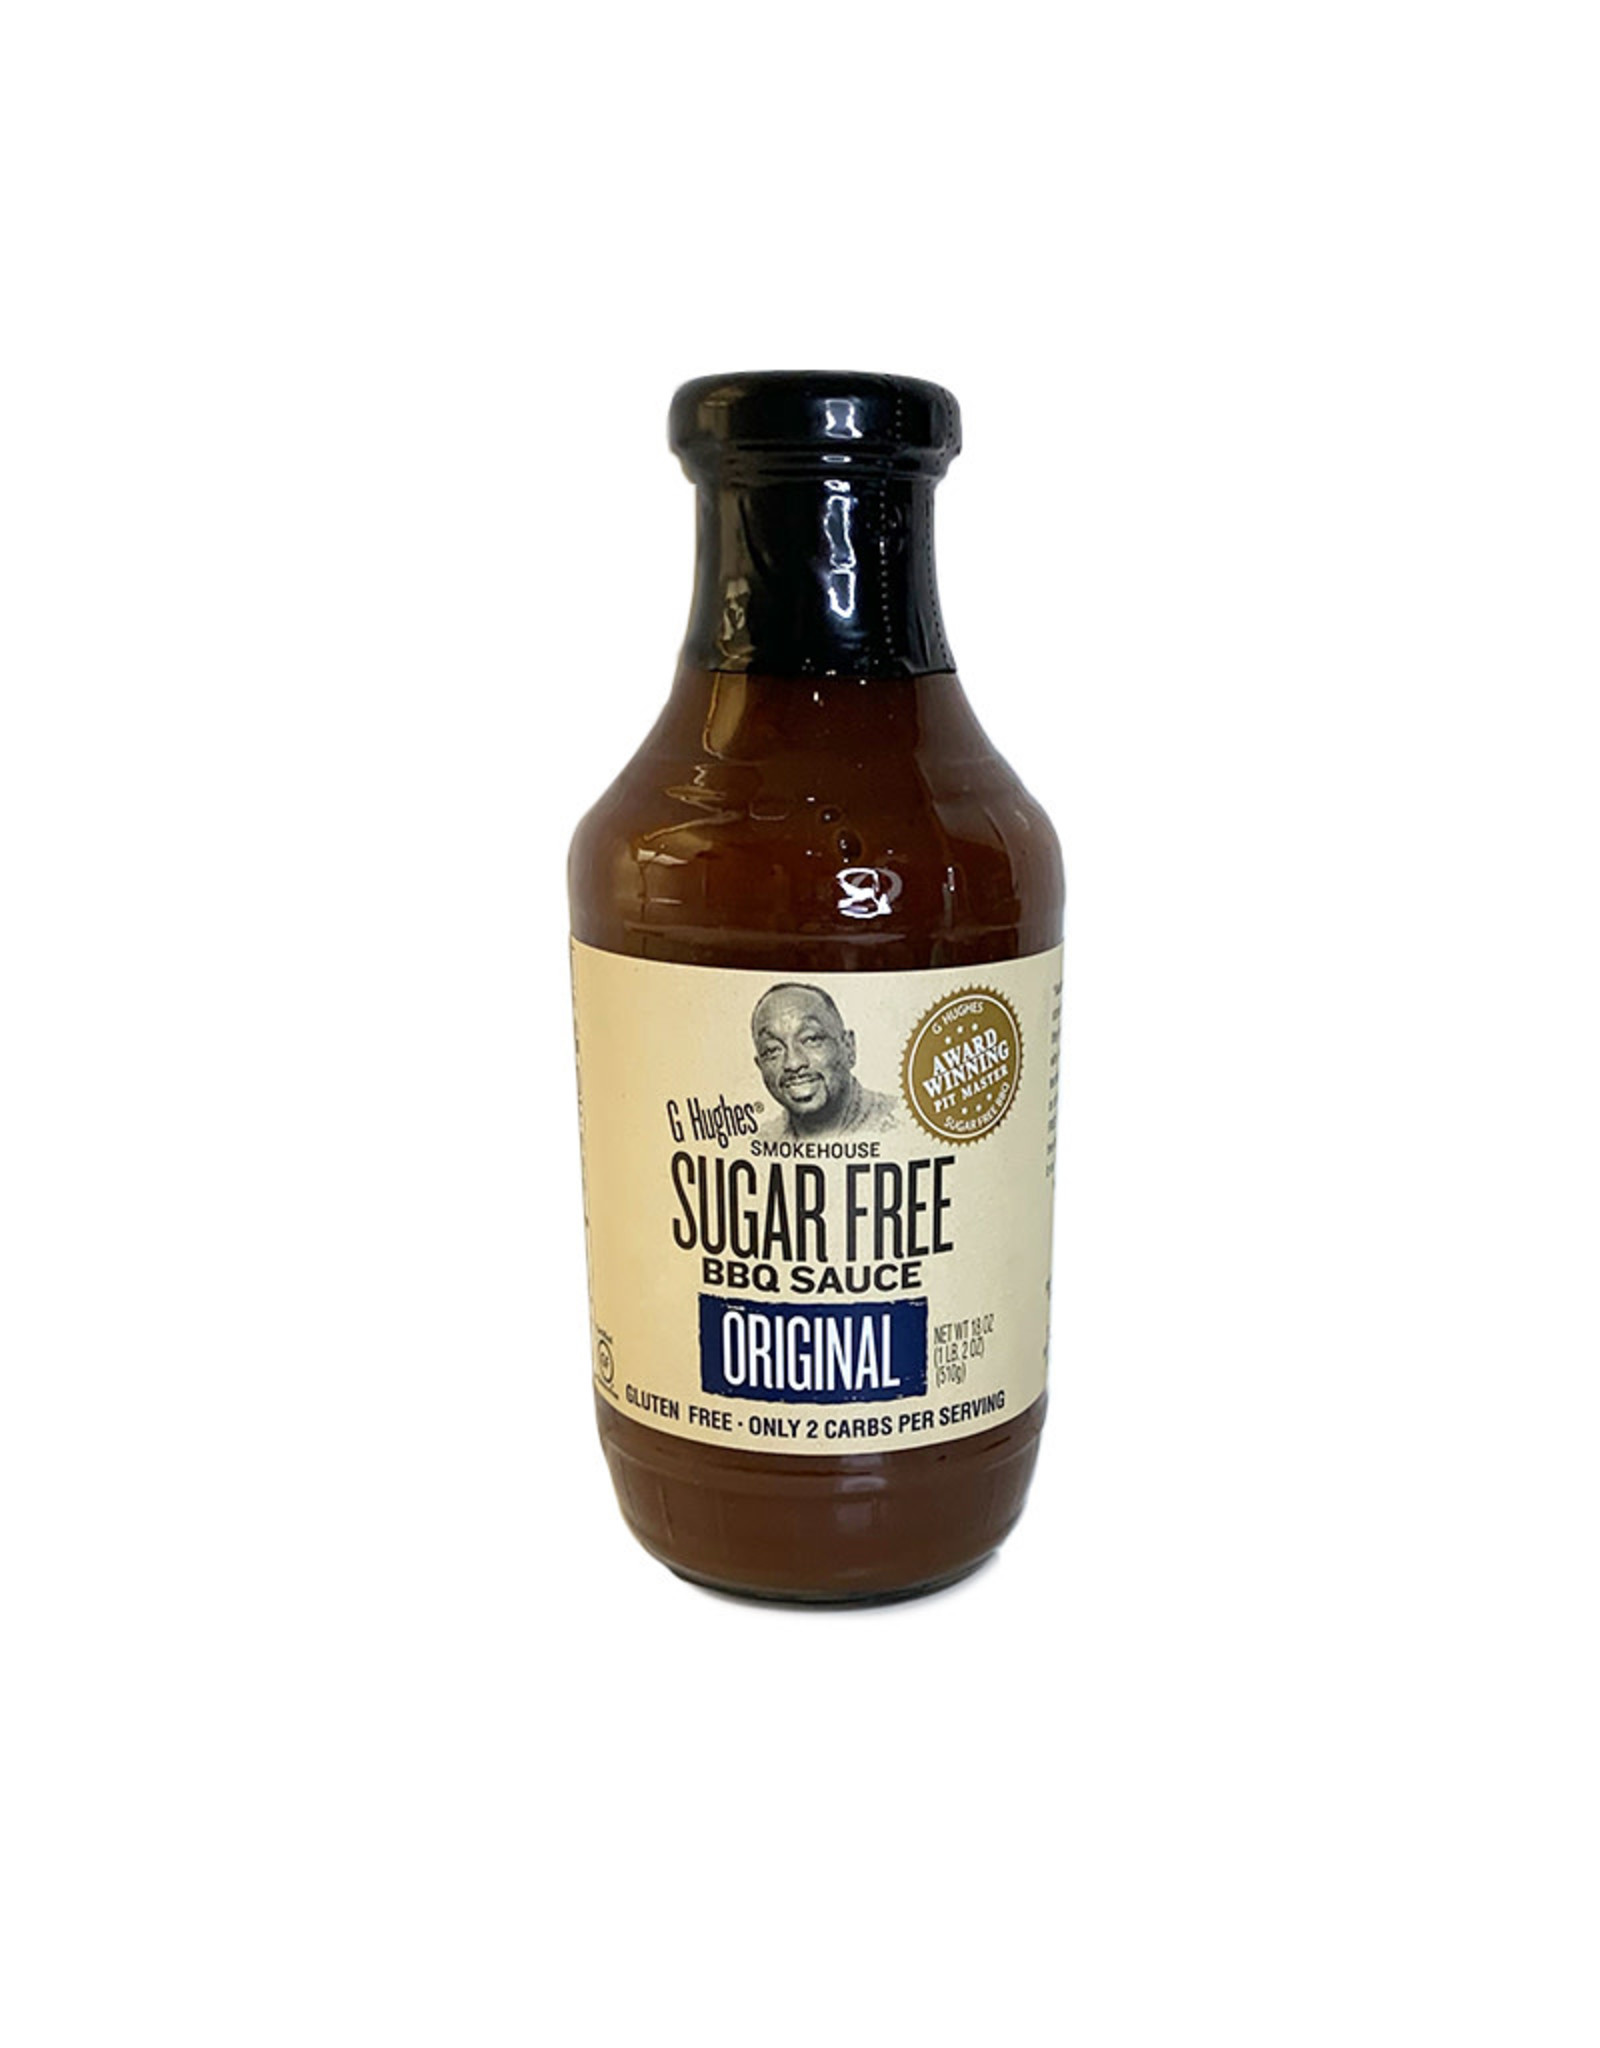 G. Hughes G. Hughes - Sugar Free BBQ Sauce, Original (510g)